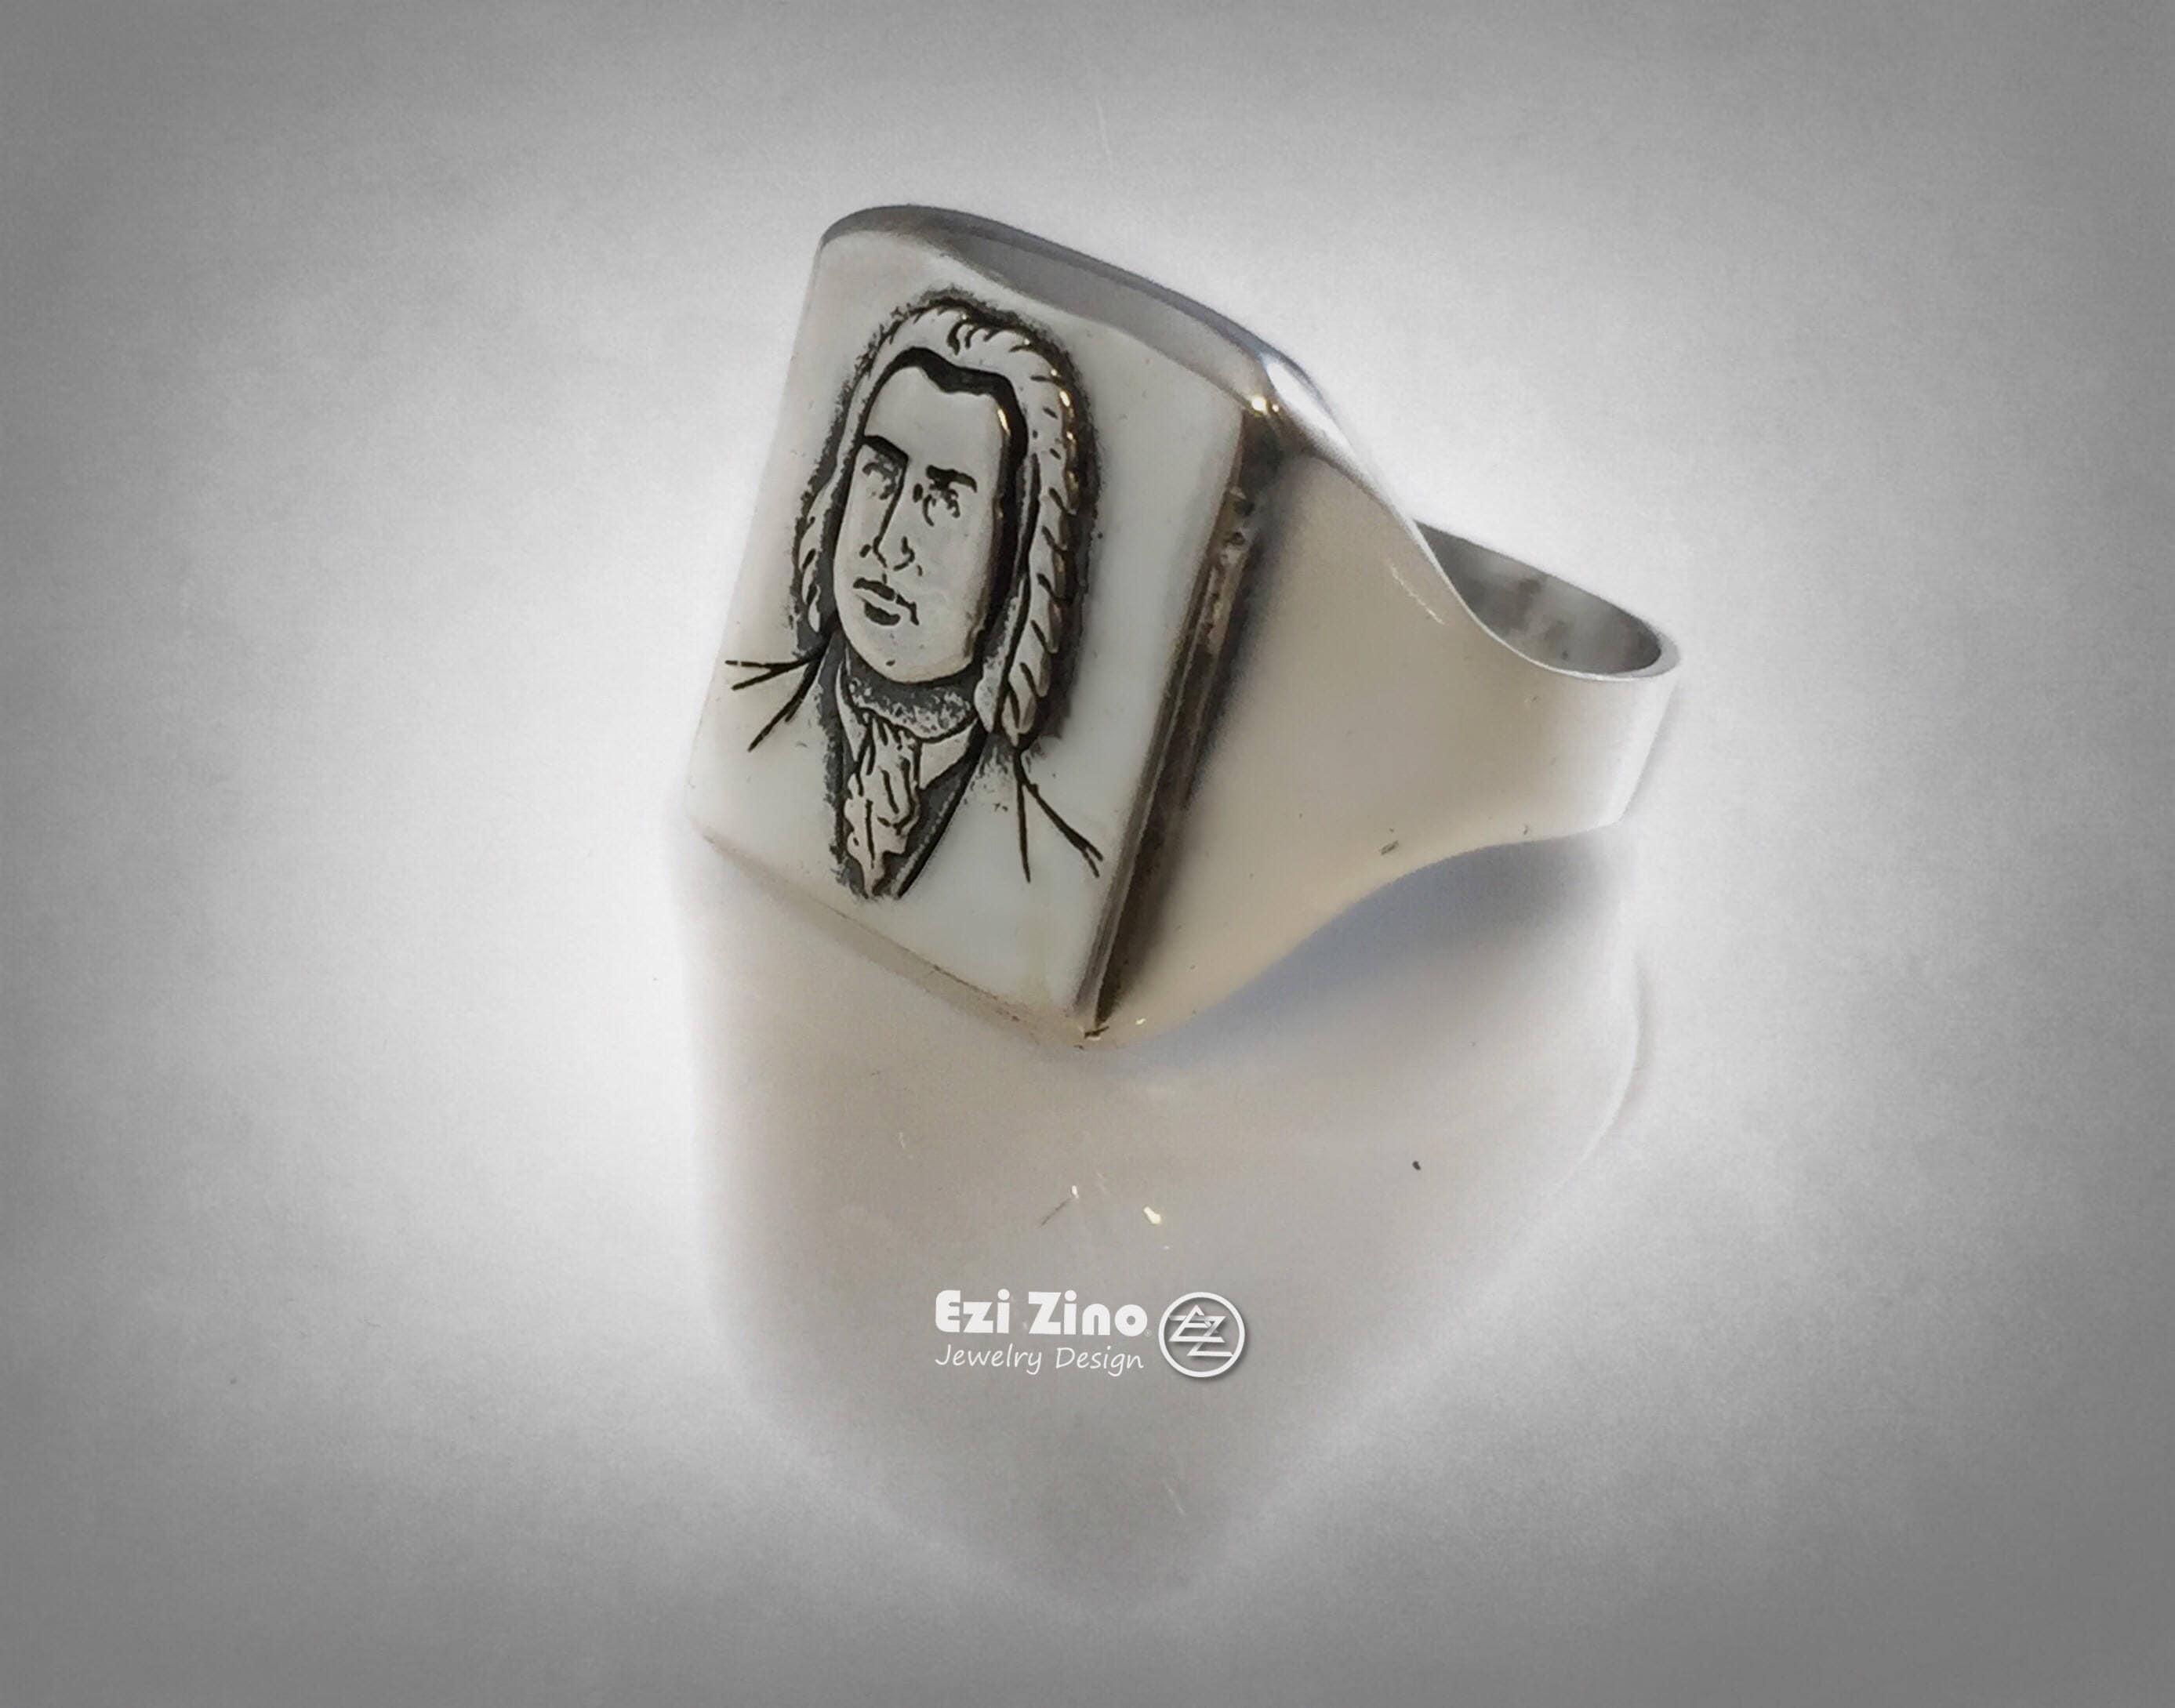 Ludwig Van Beethoven German Composer /& Pianist Ring Solid Sterling Silver 925 By Ezi Zino